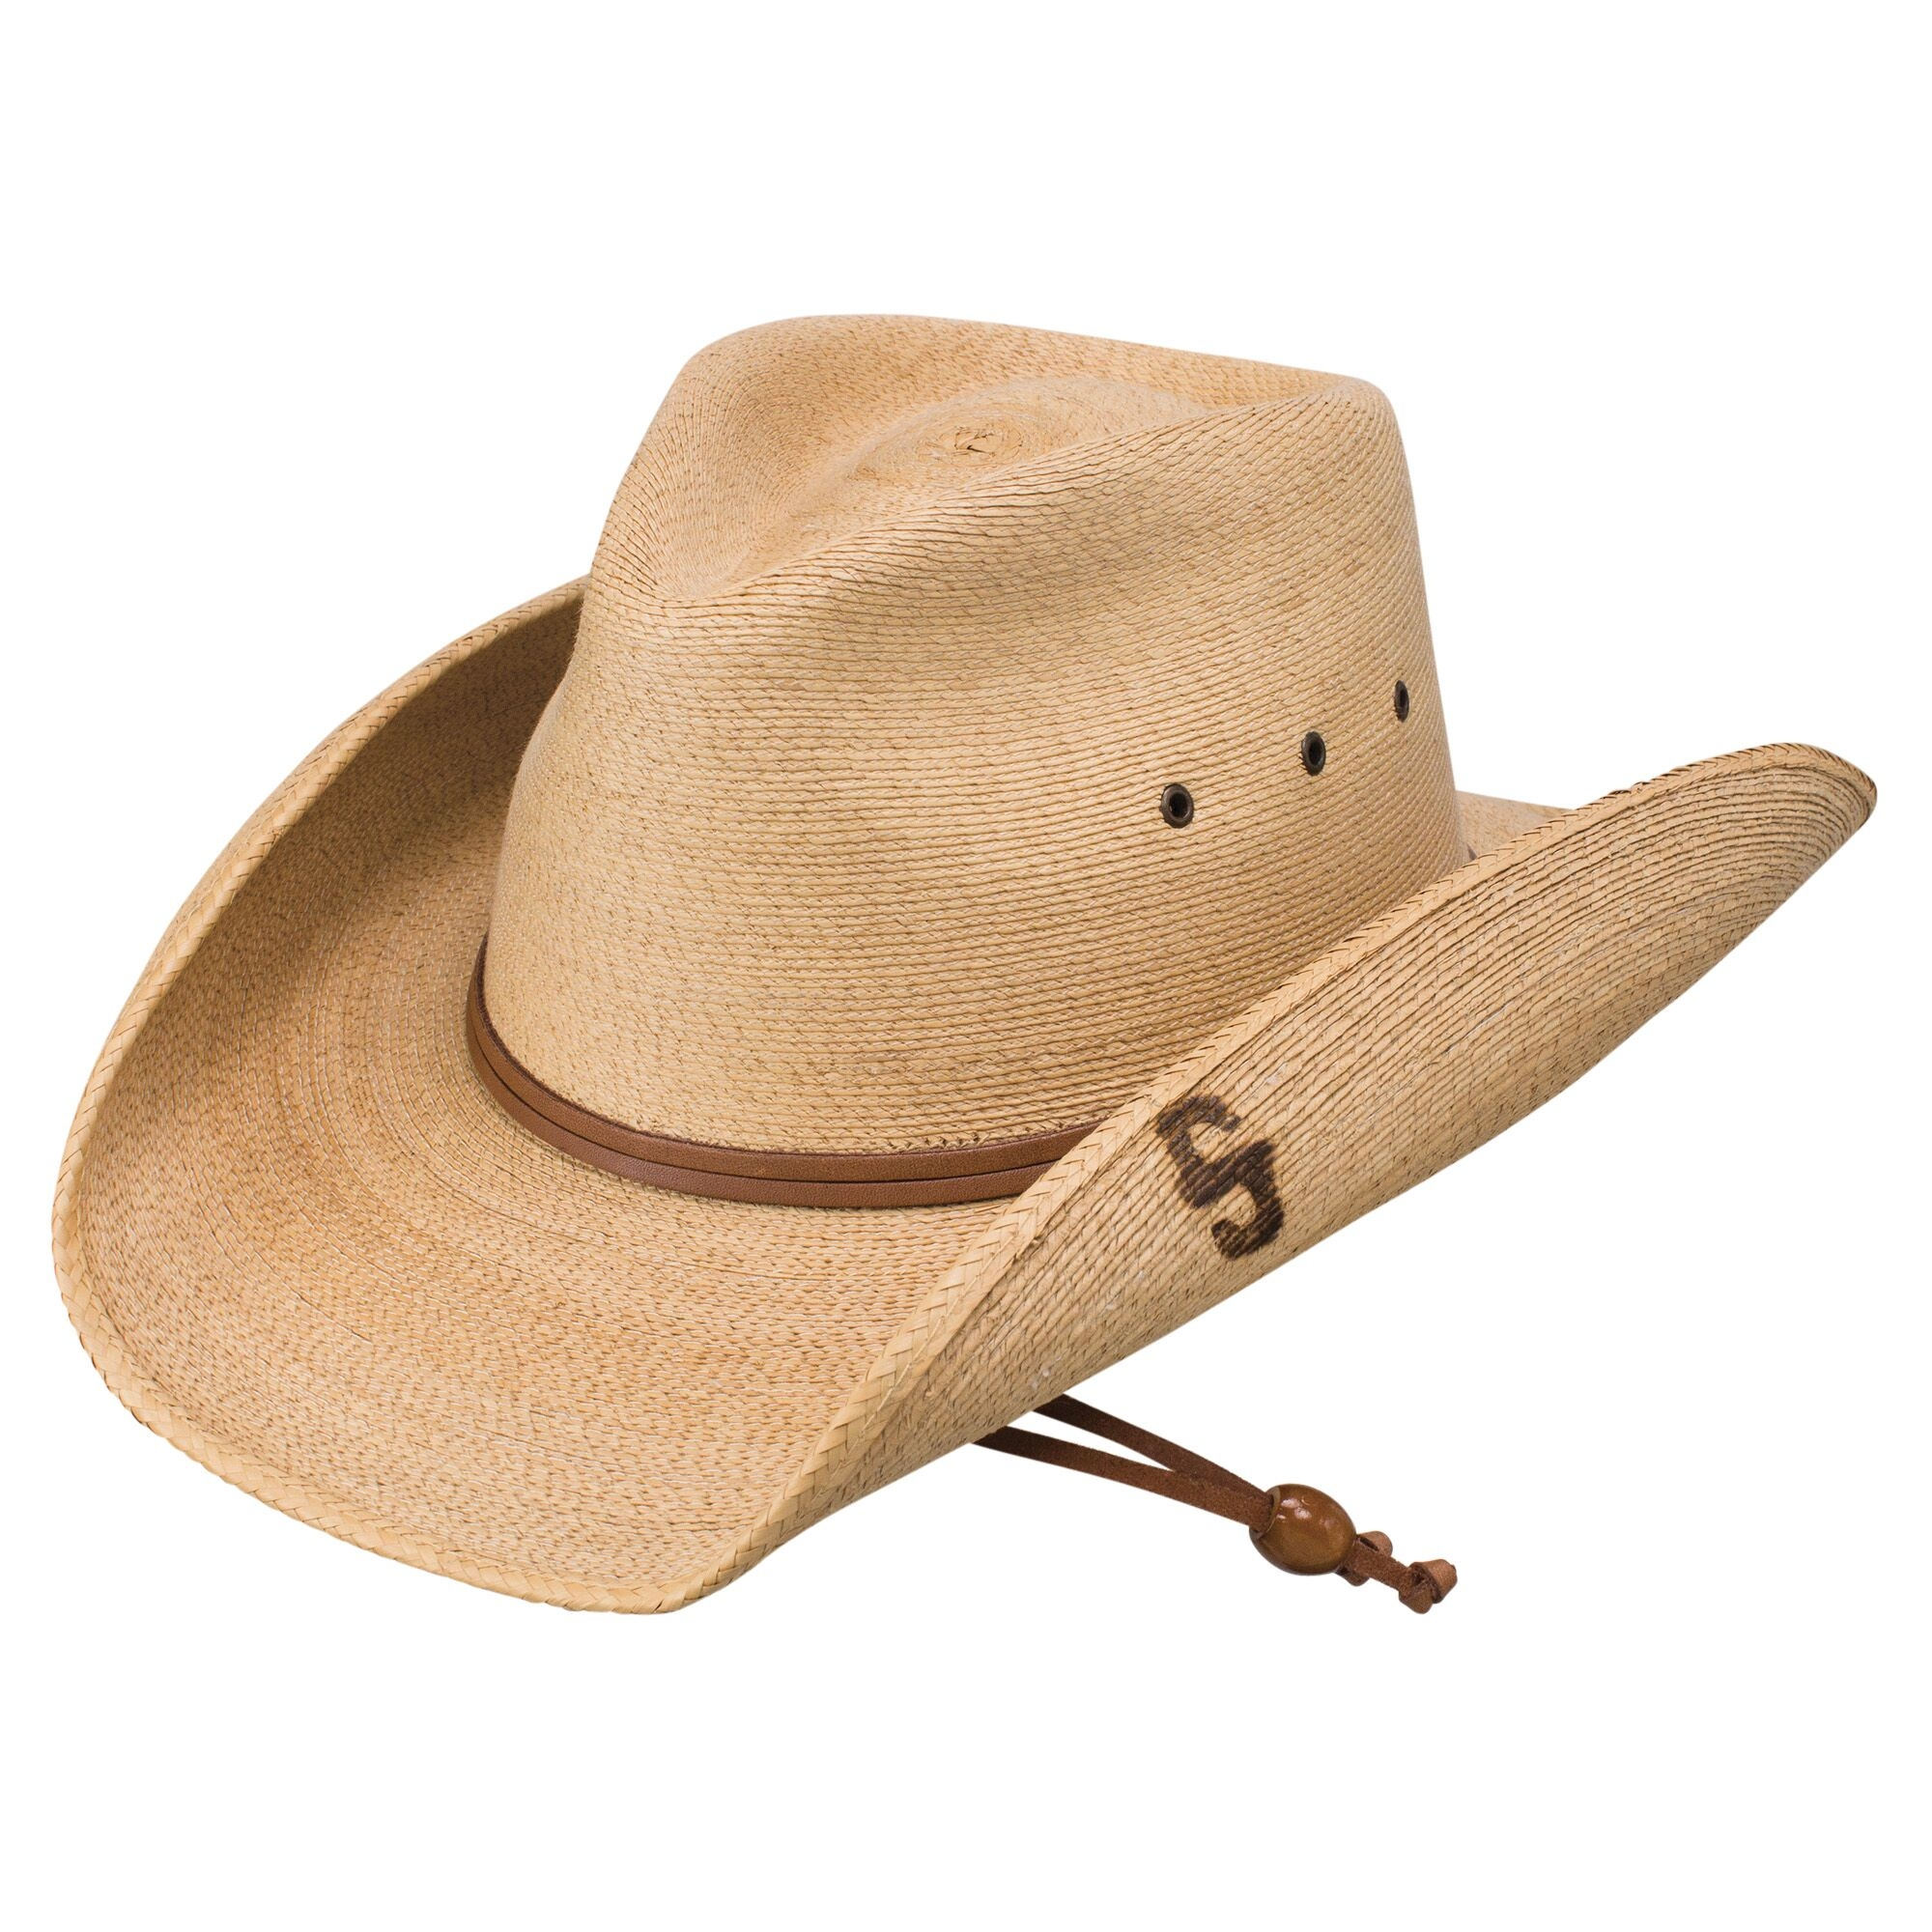 Stetson Contoy - Straw Cowboy Hat